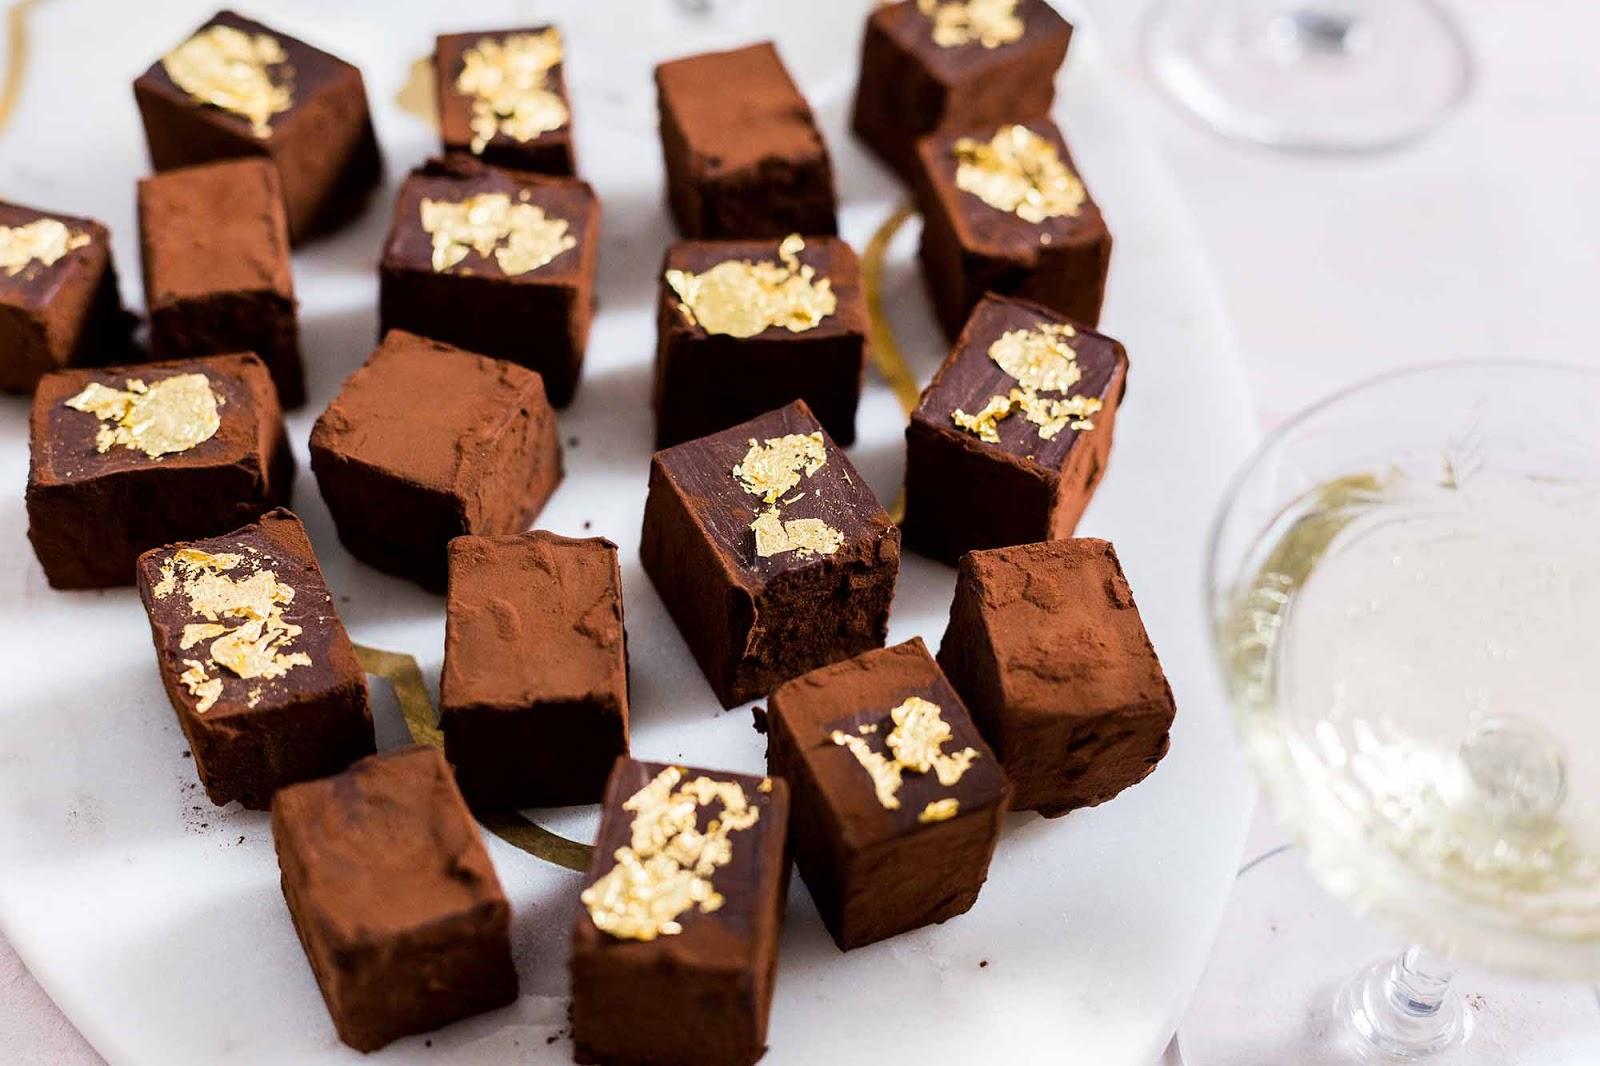 Champagne Chocolate Truffles